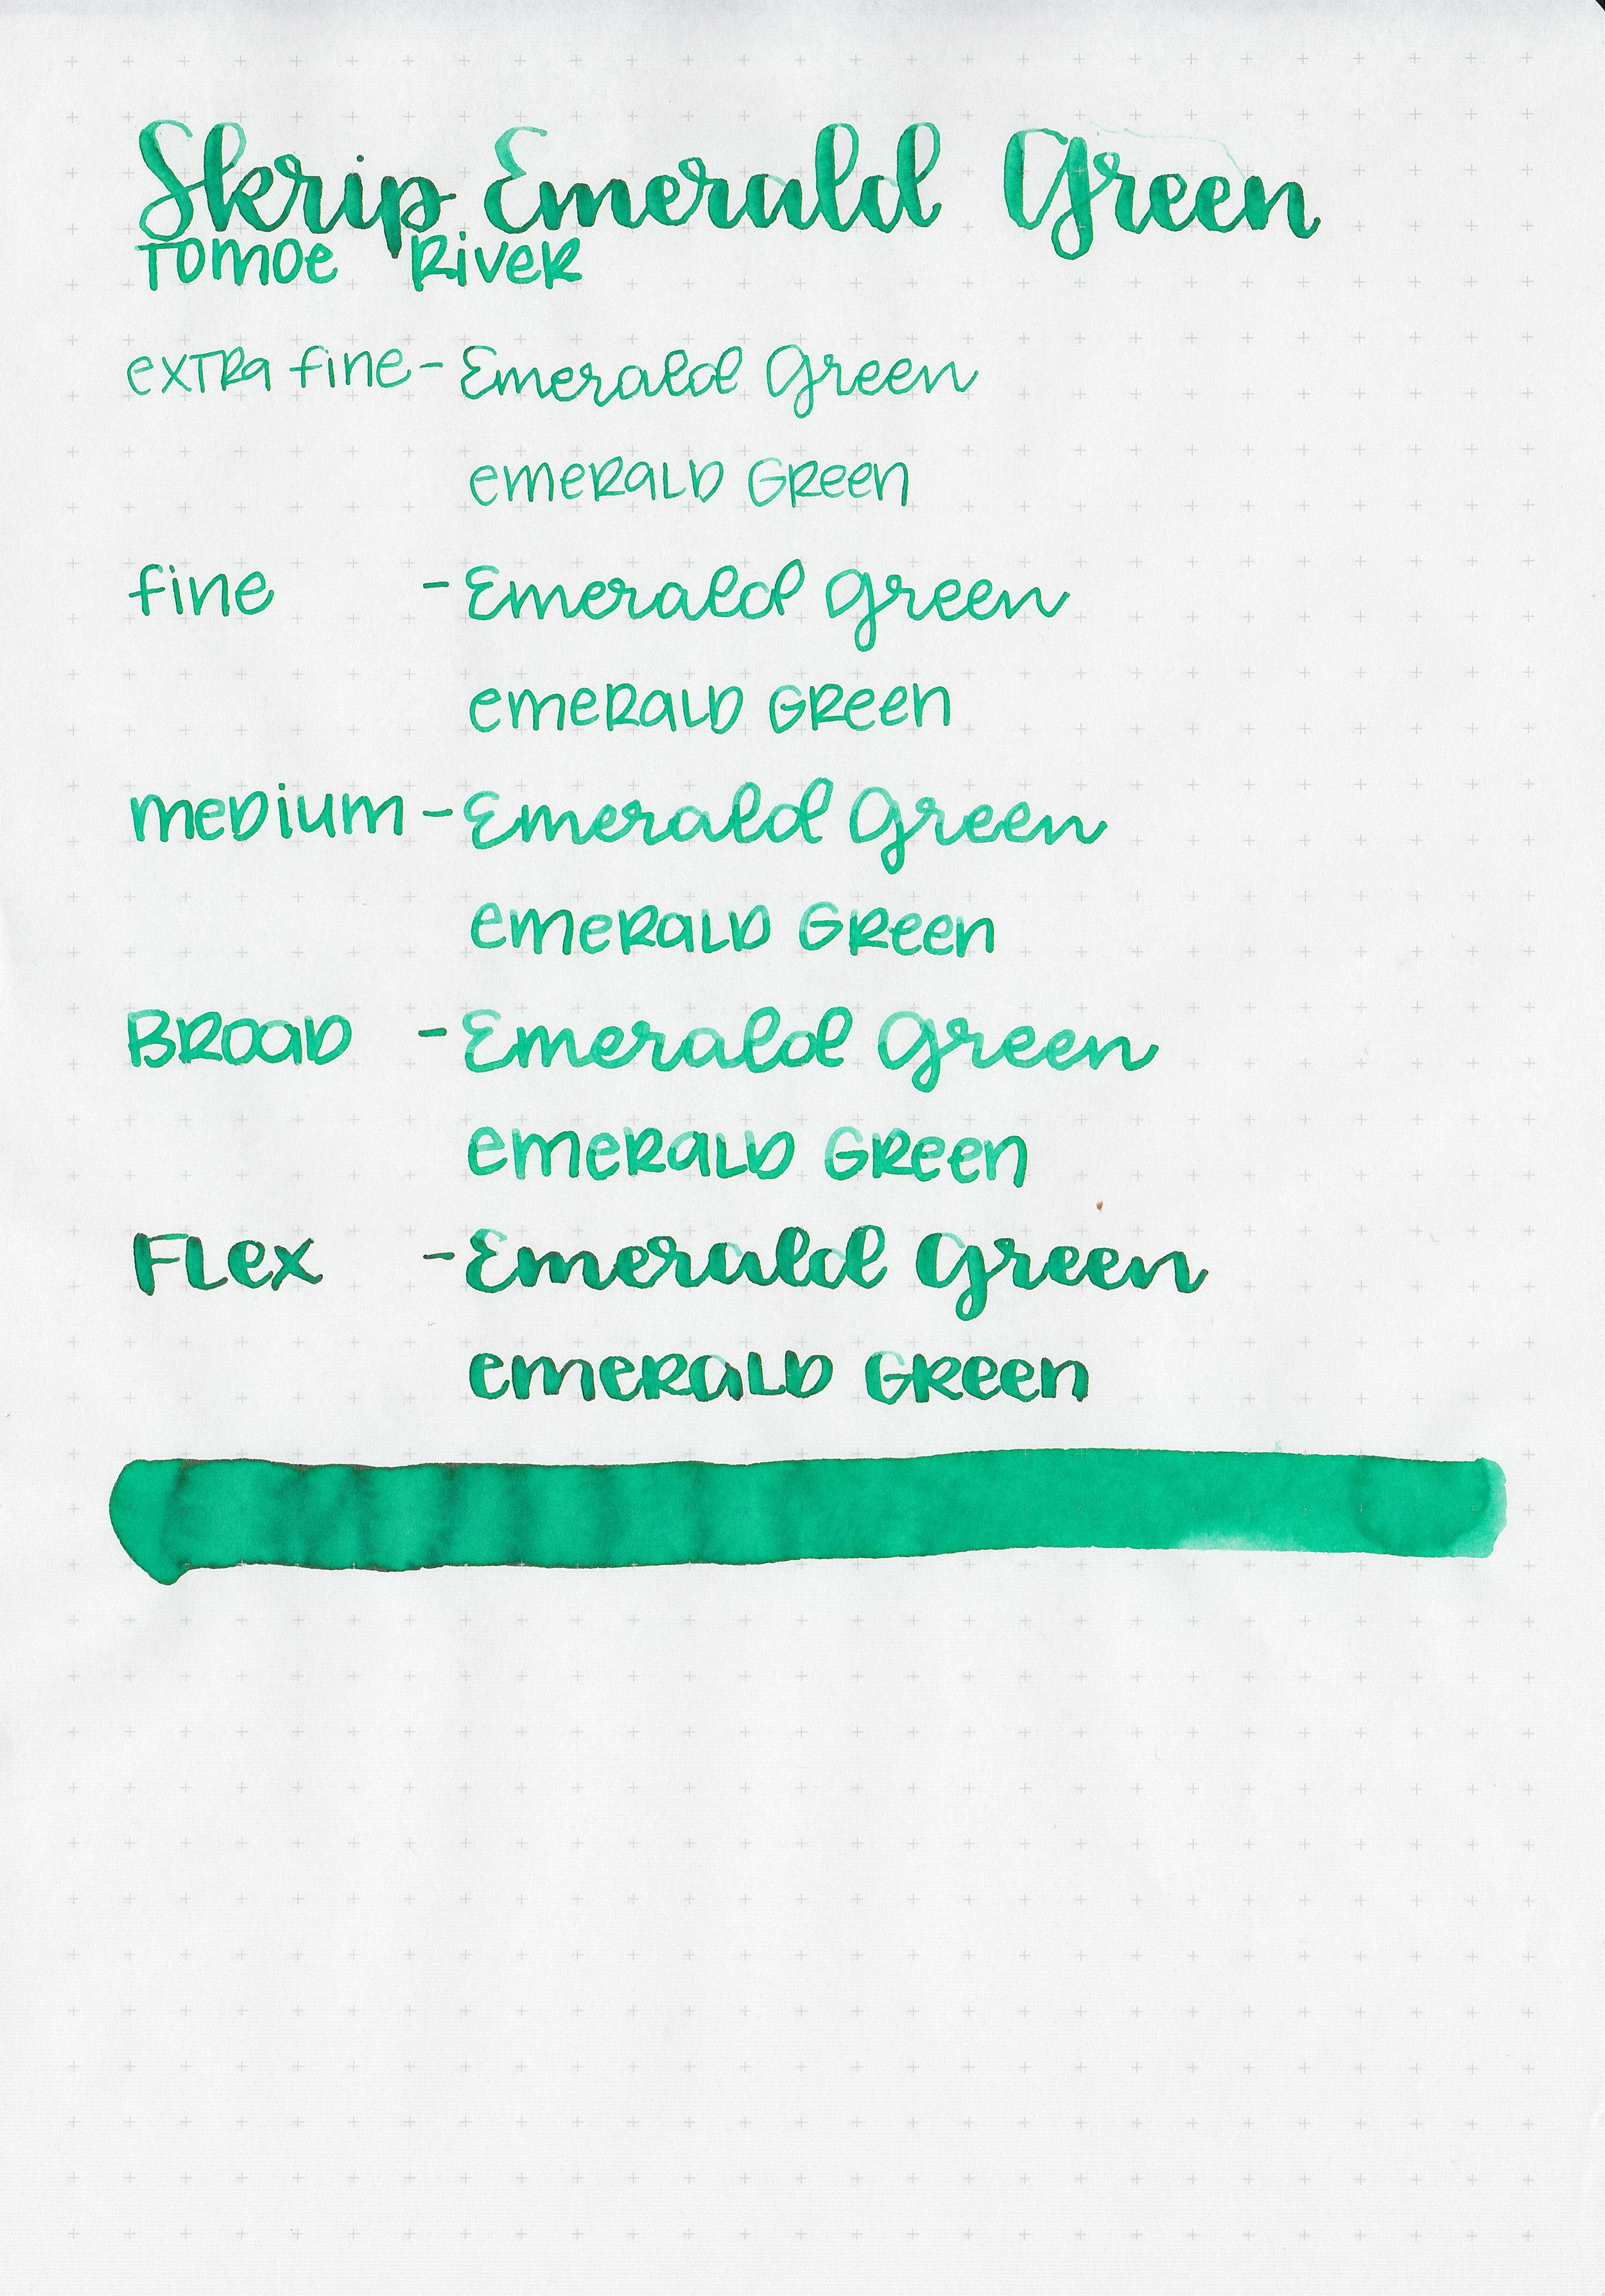 skr-emerald-green-11.jpg